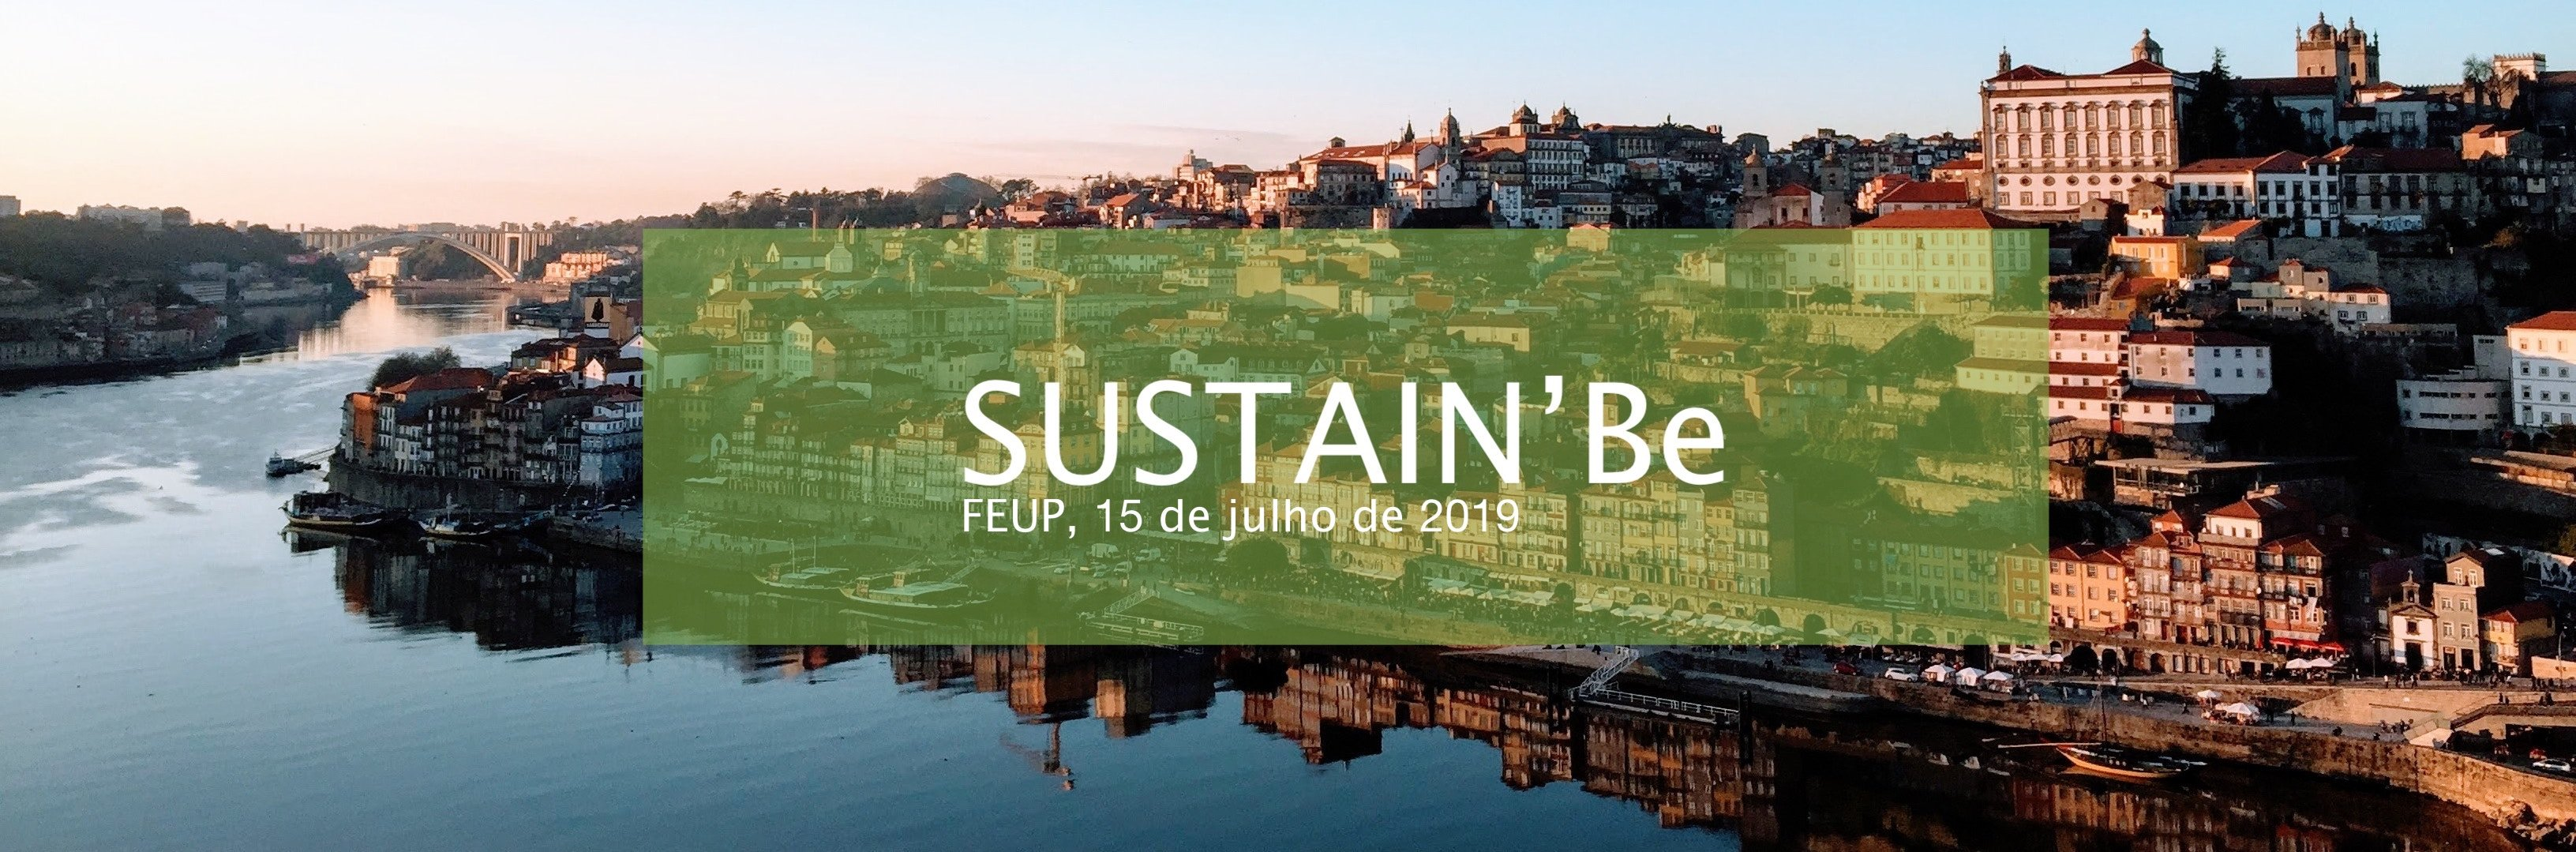 Sustainbe Logo